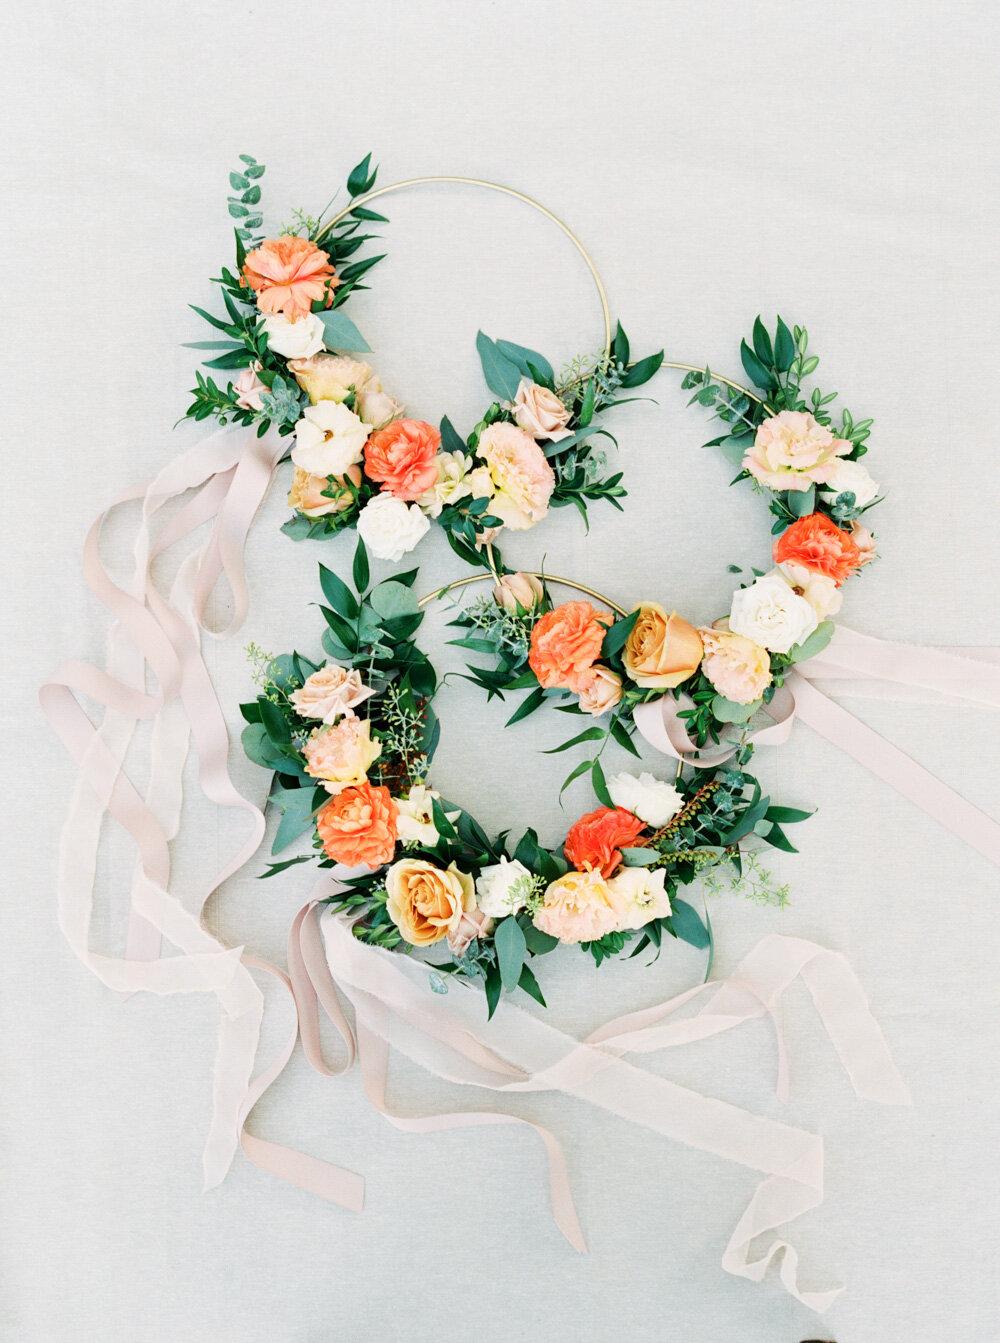 vineyard-bride-vendor-spotlight-lush-florals-and-events-niagara-wedding-florist-vendors-toronto-southern-ontario-001.jpg